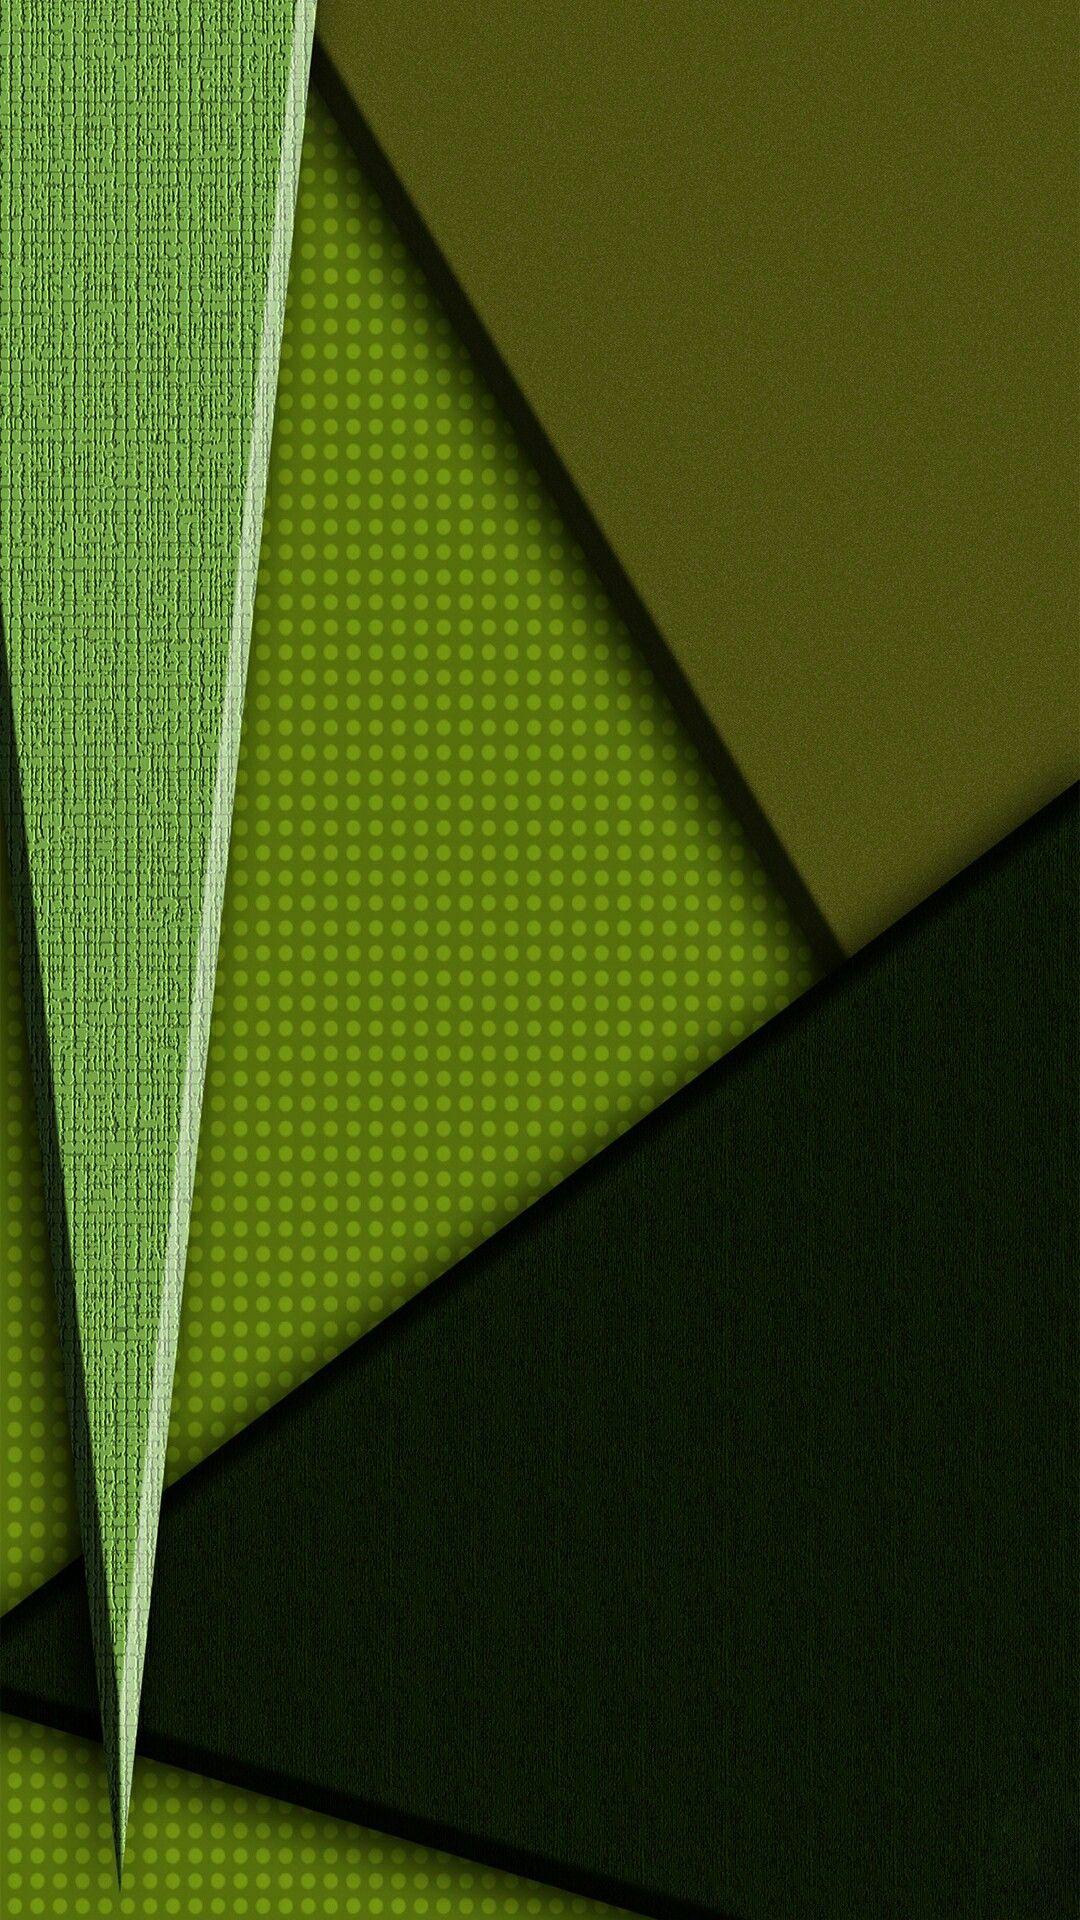 Green Olive Abstract Wallpaper Lock Screen Wallpaper